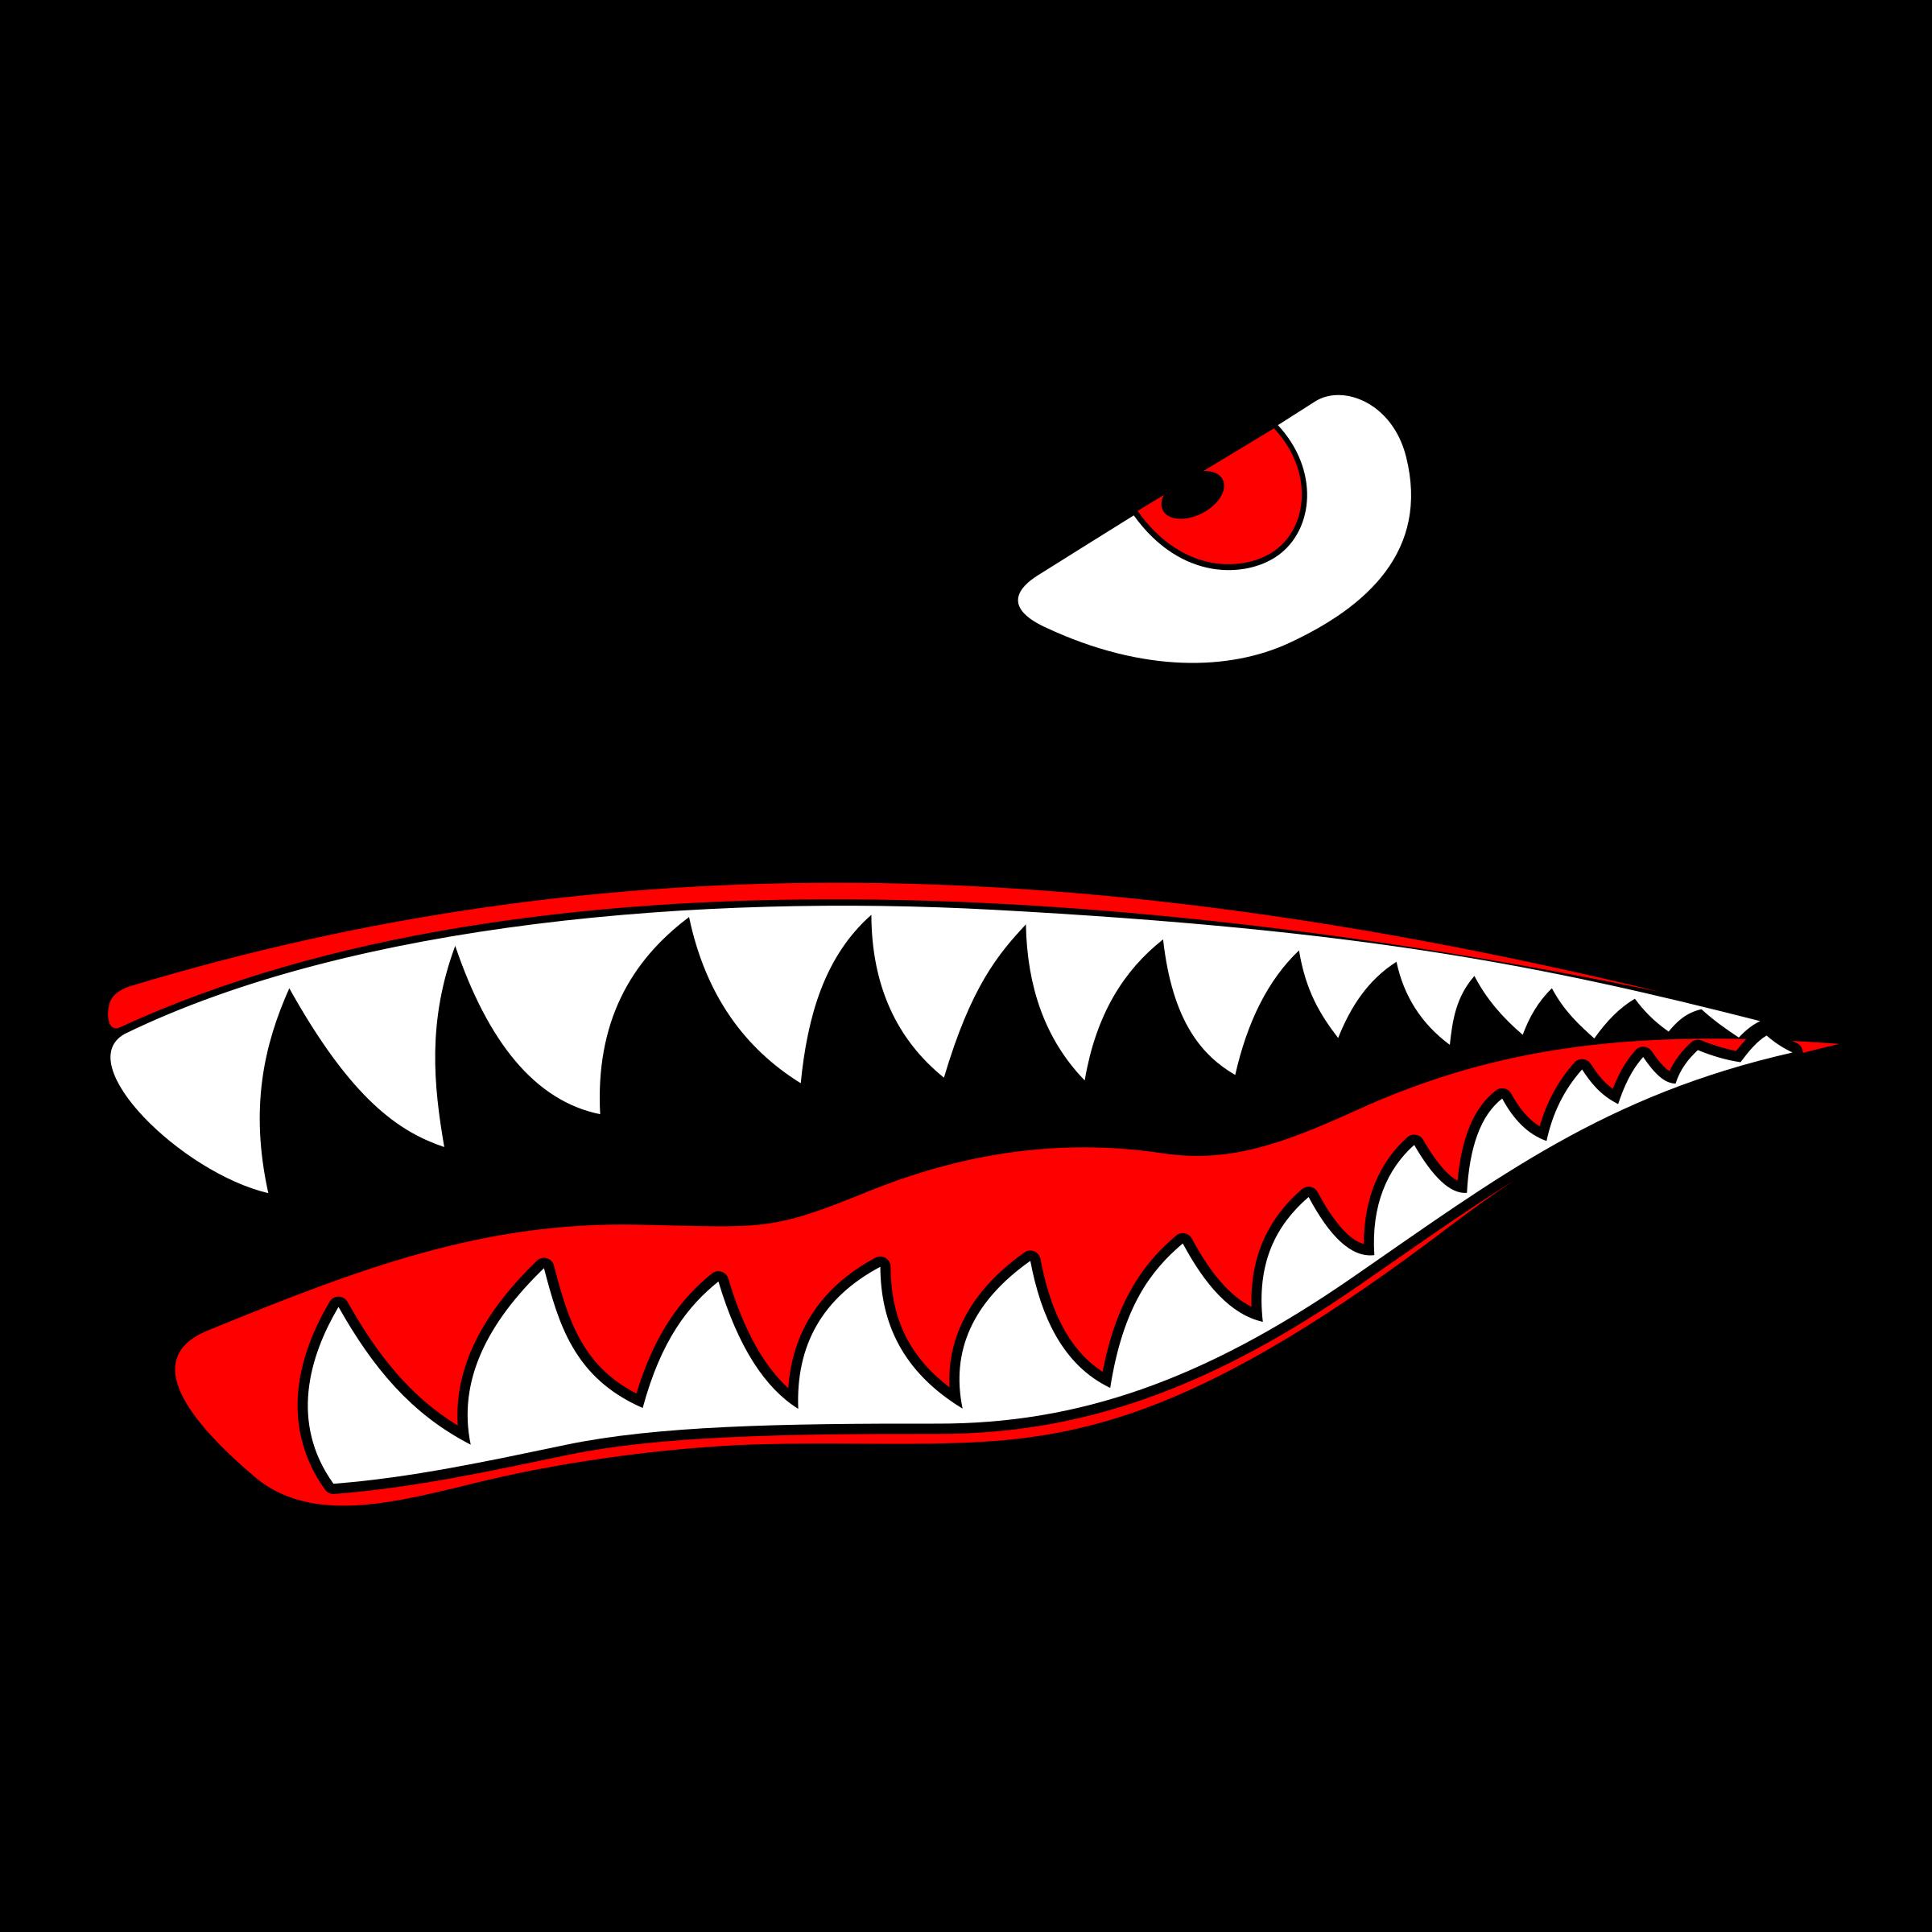 Shark teeth images clipart jpg royalty free Shark Eye and teeth vector clipart image - Free stock photo ... jpg royalty free